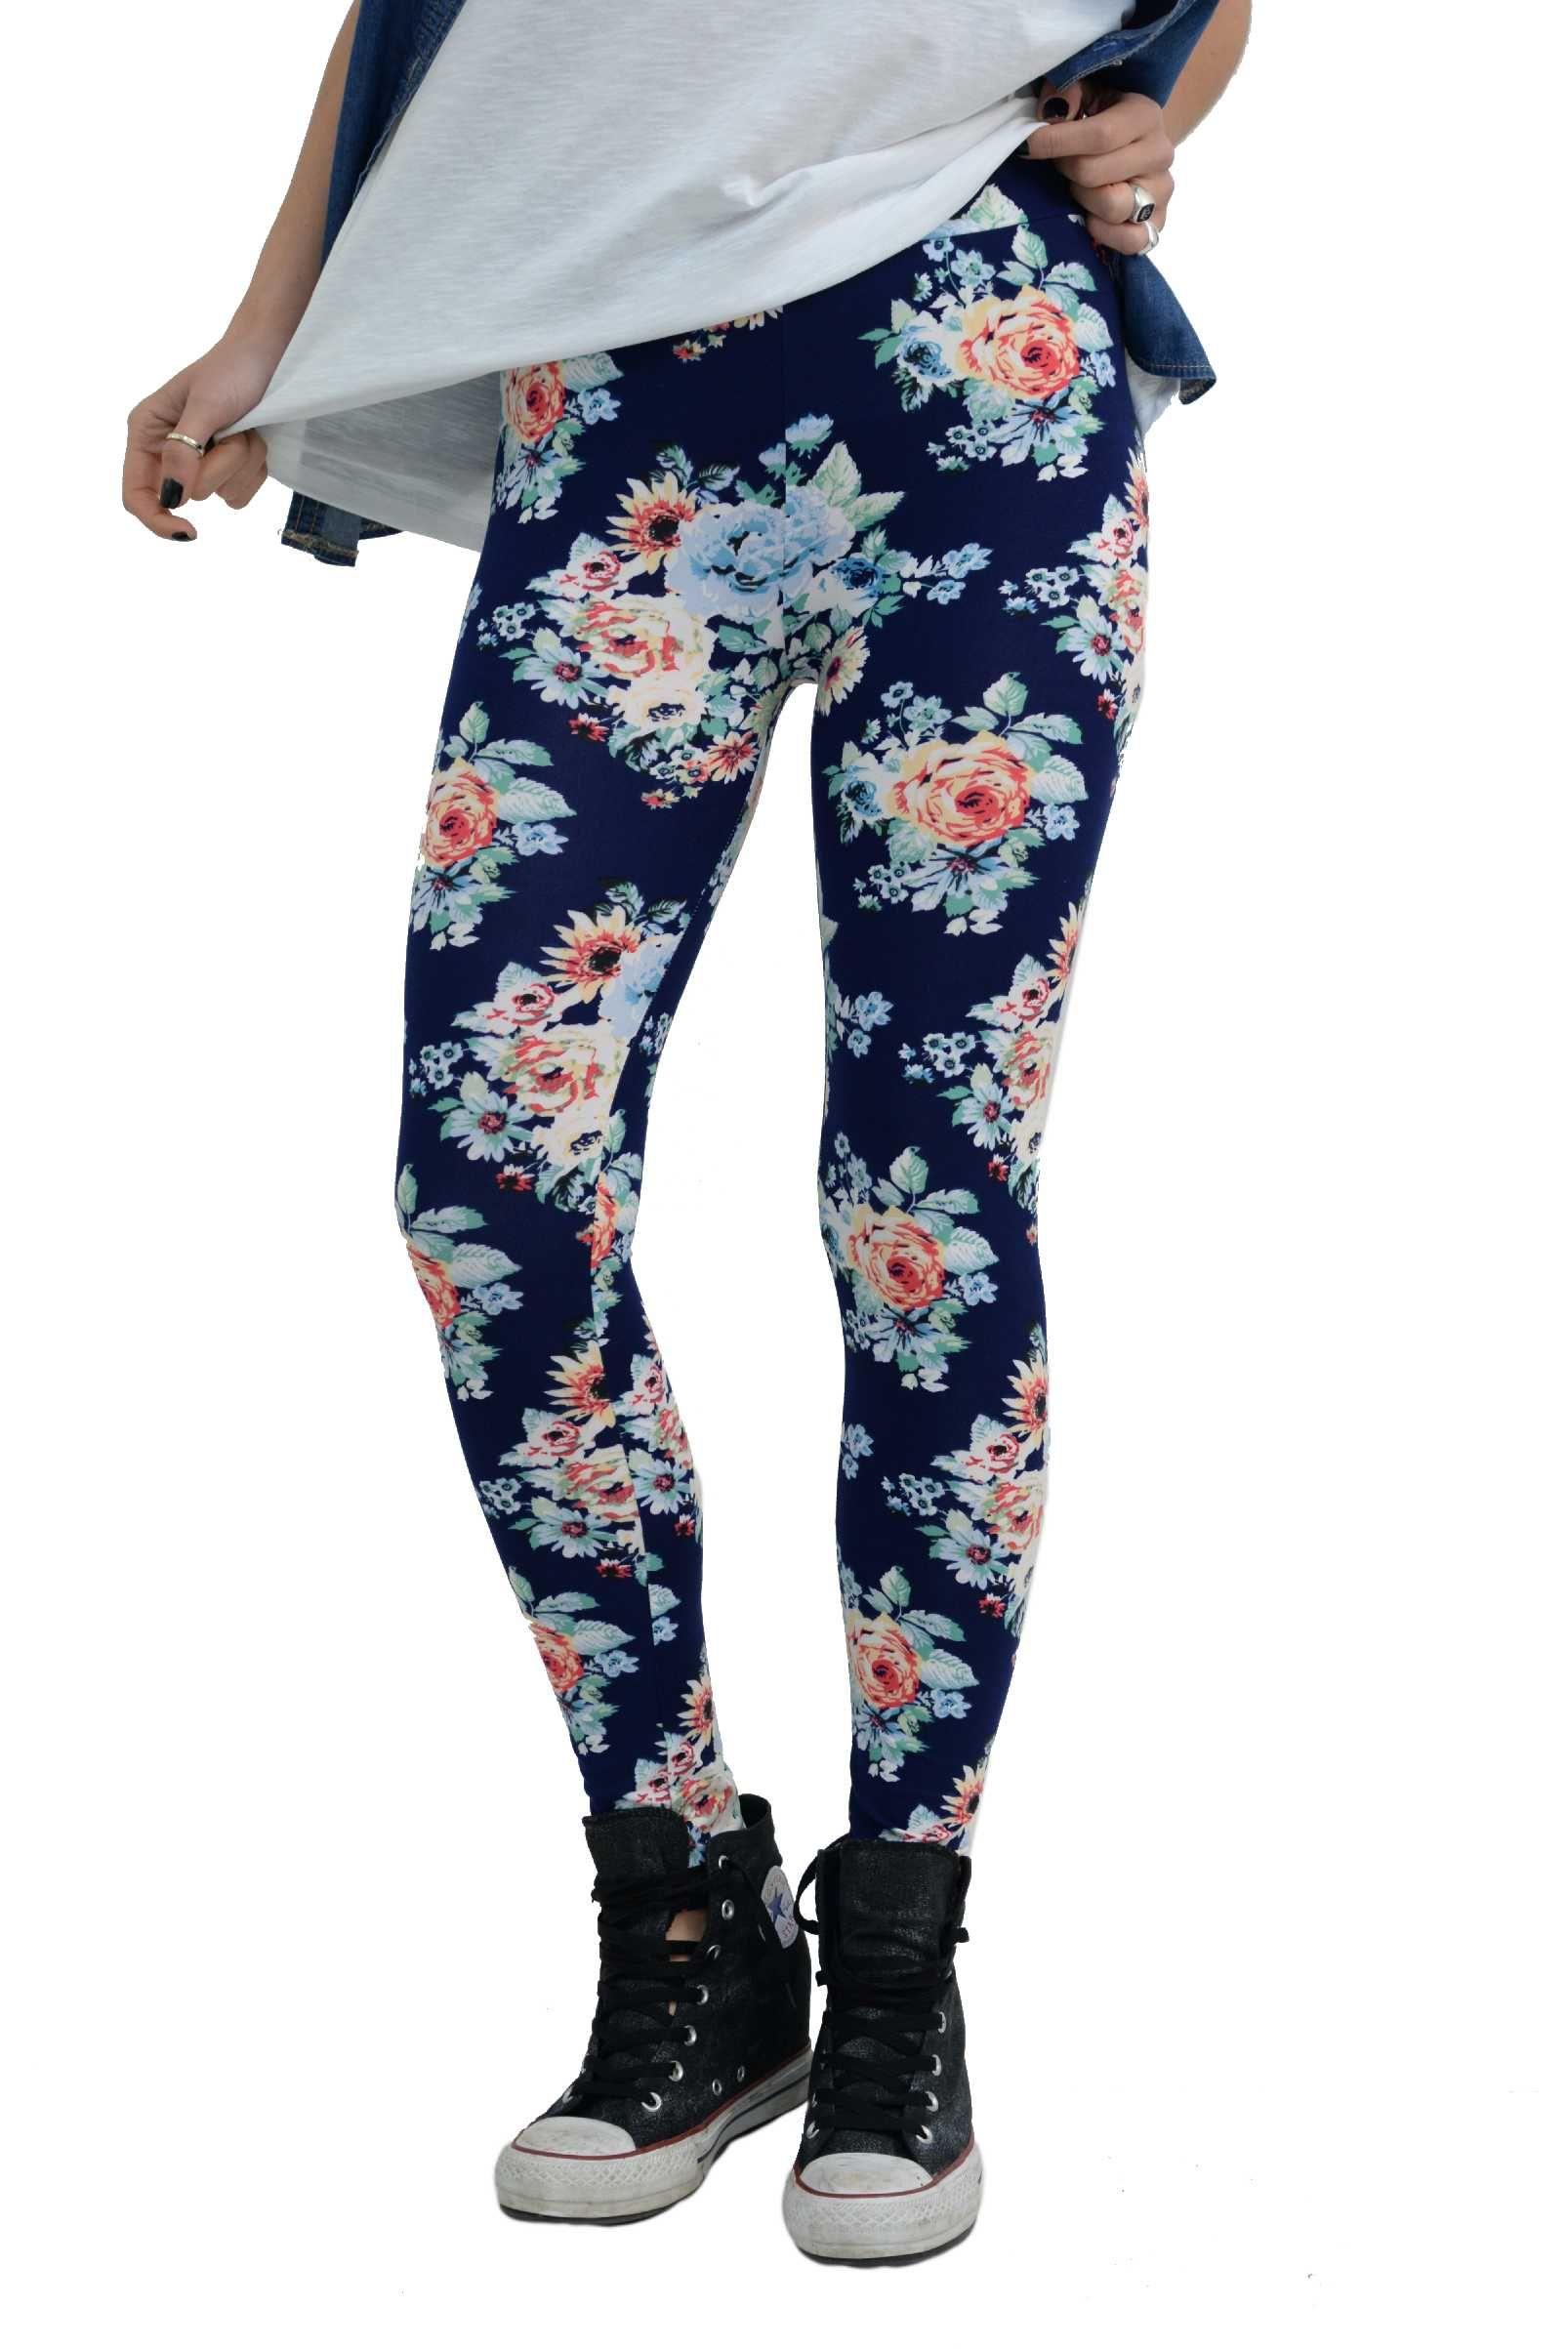 10f447830766 Γυναικείο παντελόνι κολάν βαμβακερό με floral σχέδιο. Έχει λάστιχο στην μέση  για να προσαρμόζει στο